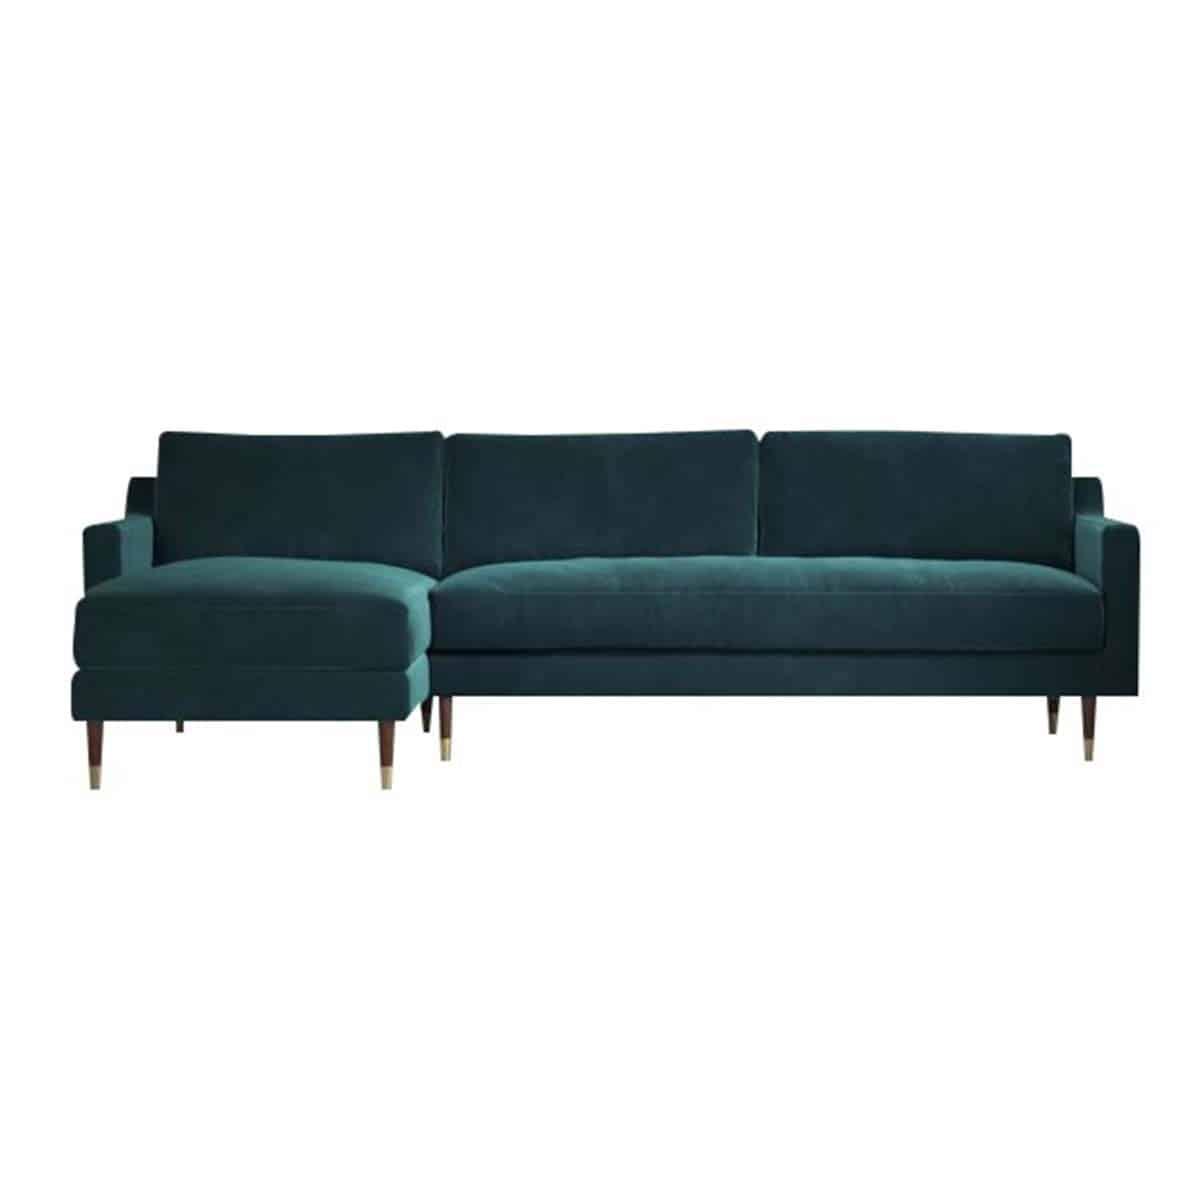 Dallas Corner Sofa DeFrae Contract Furniture